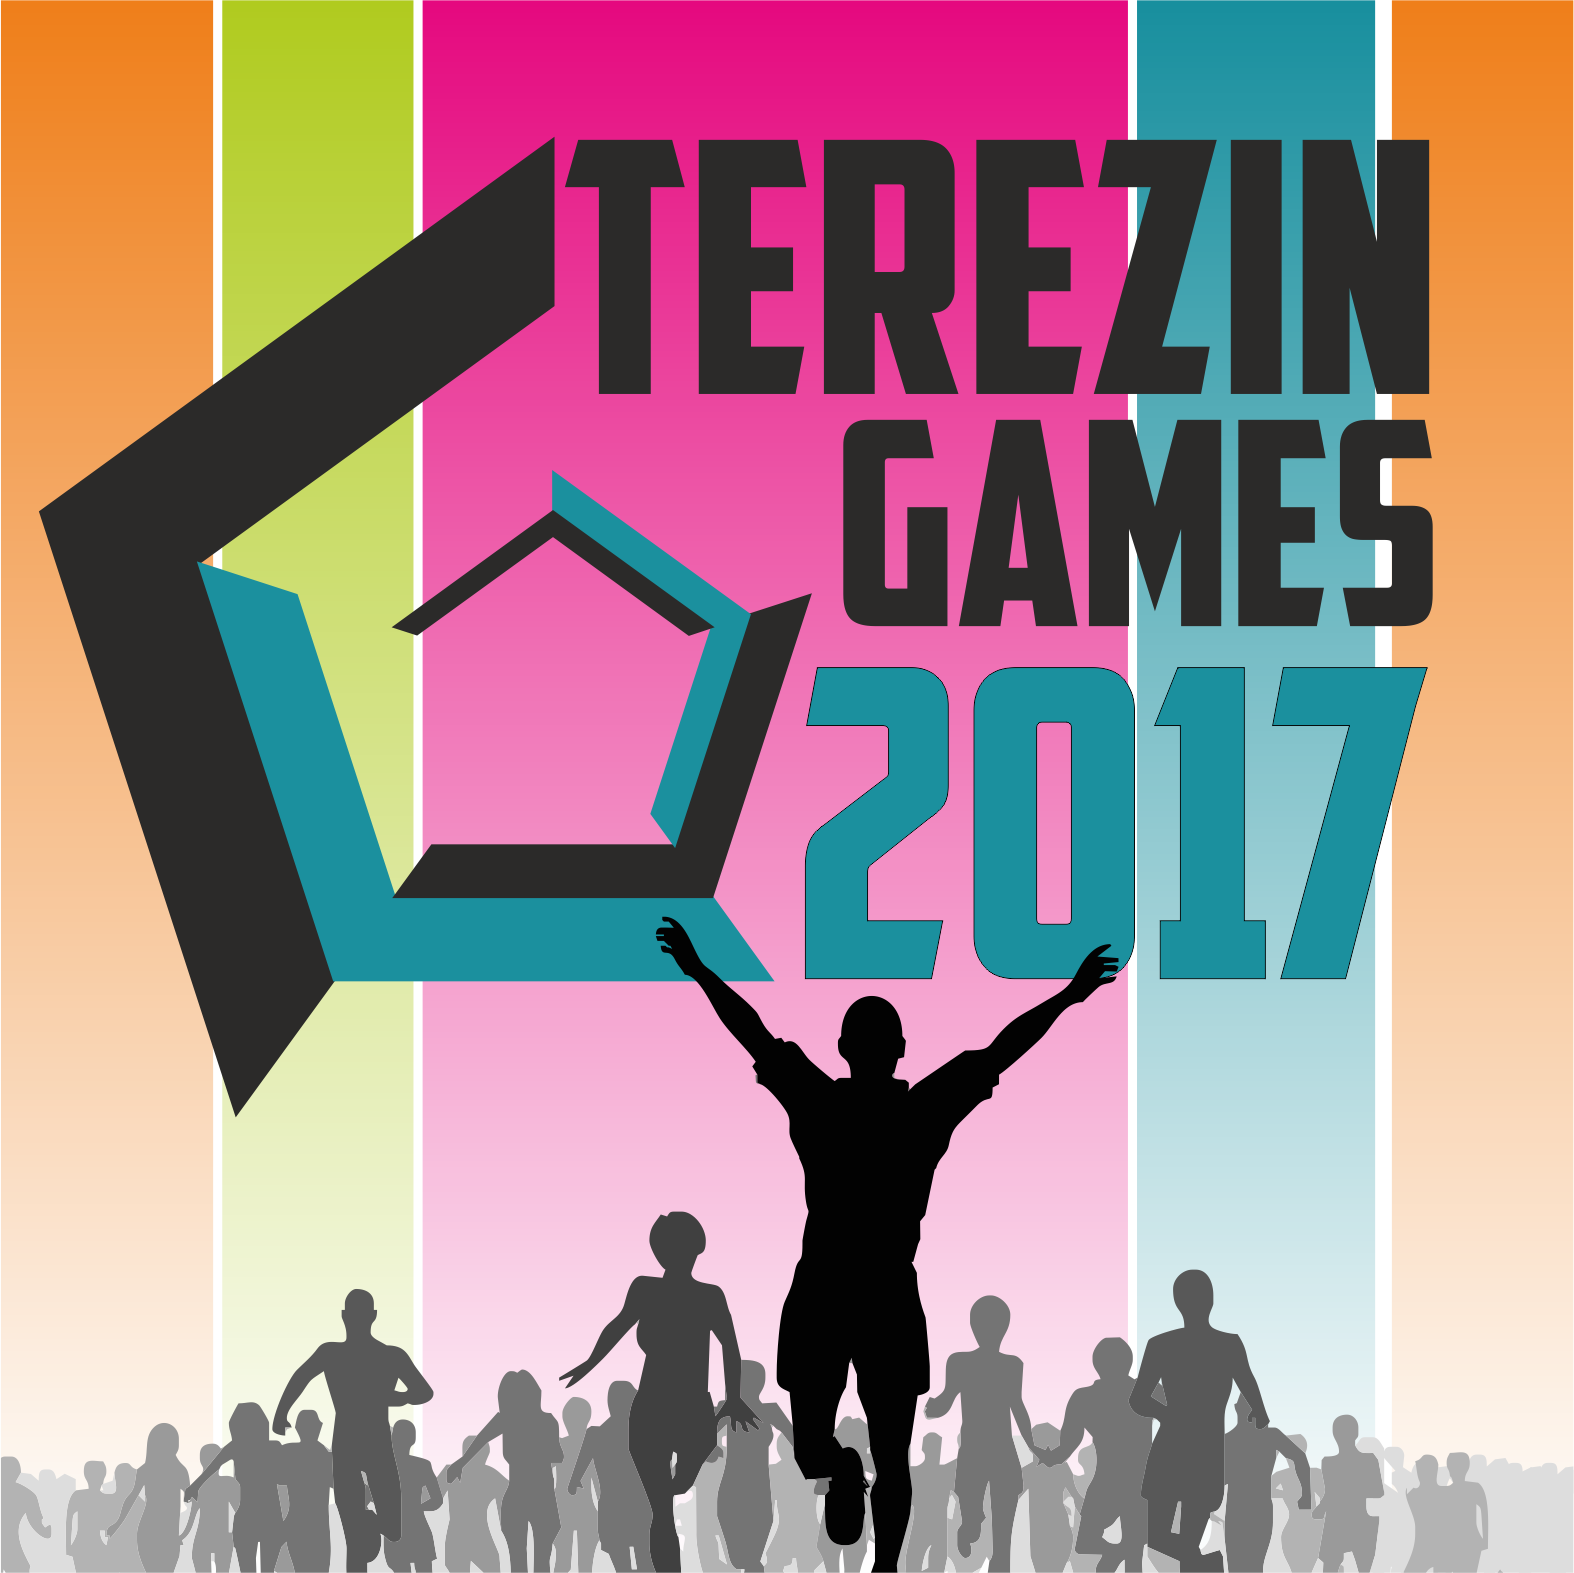 Program mega eventu Terezínské hry 2017